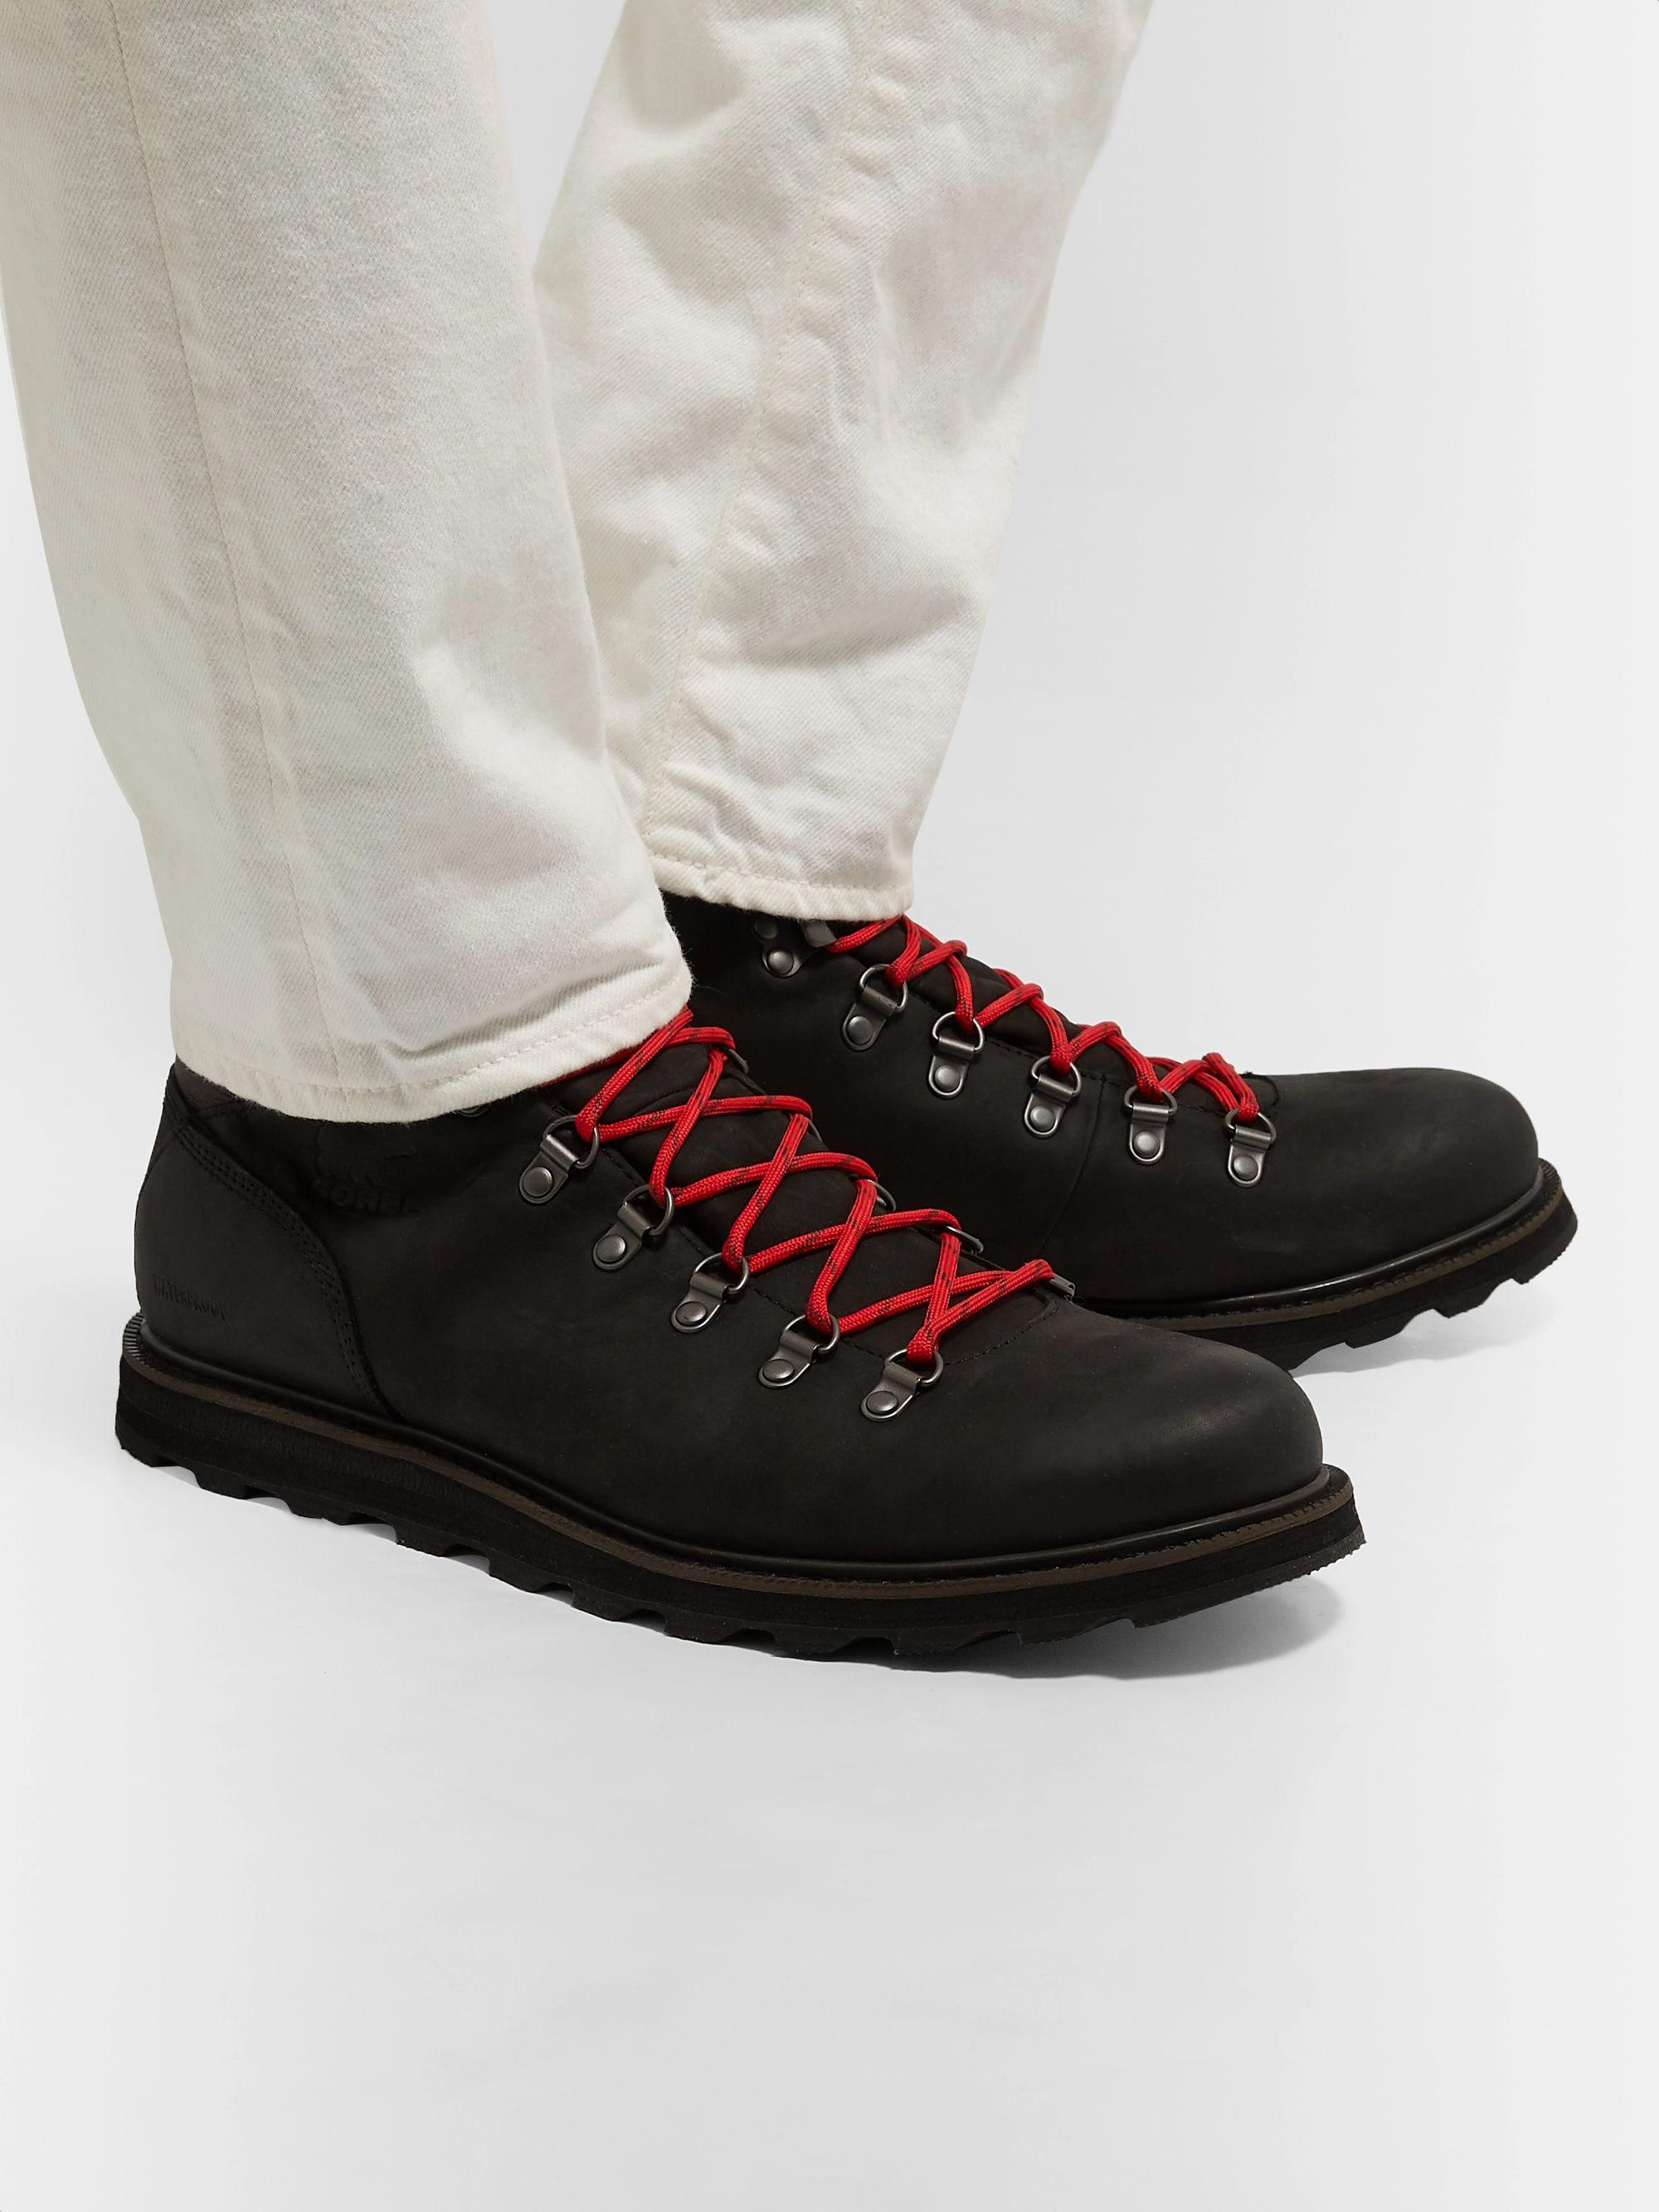 b2165ccc369 Madson Hiker Waterproof Nubuck Boots